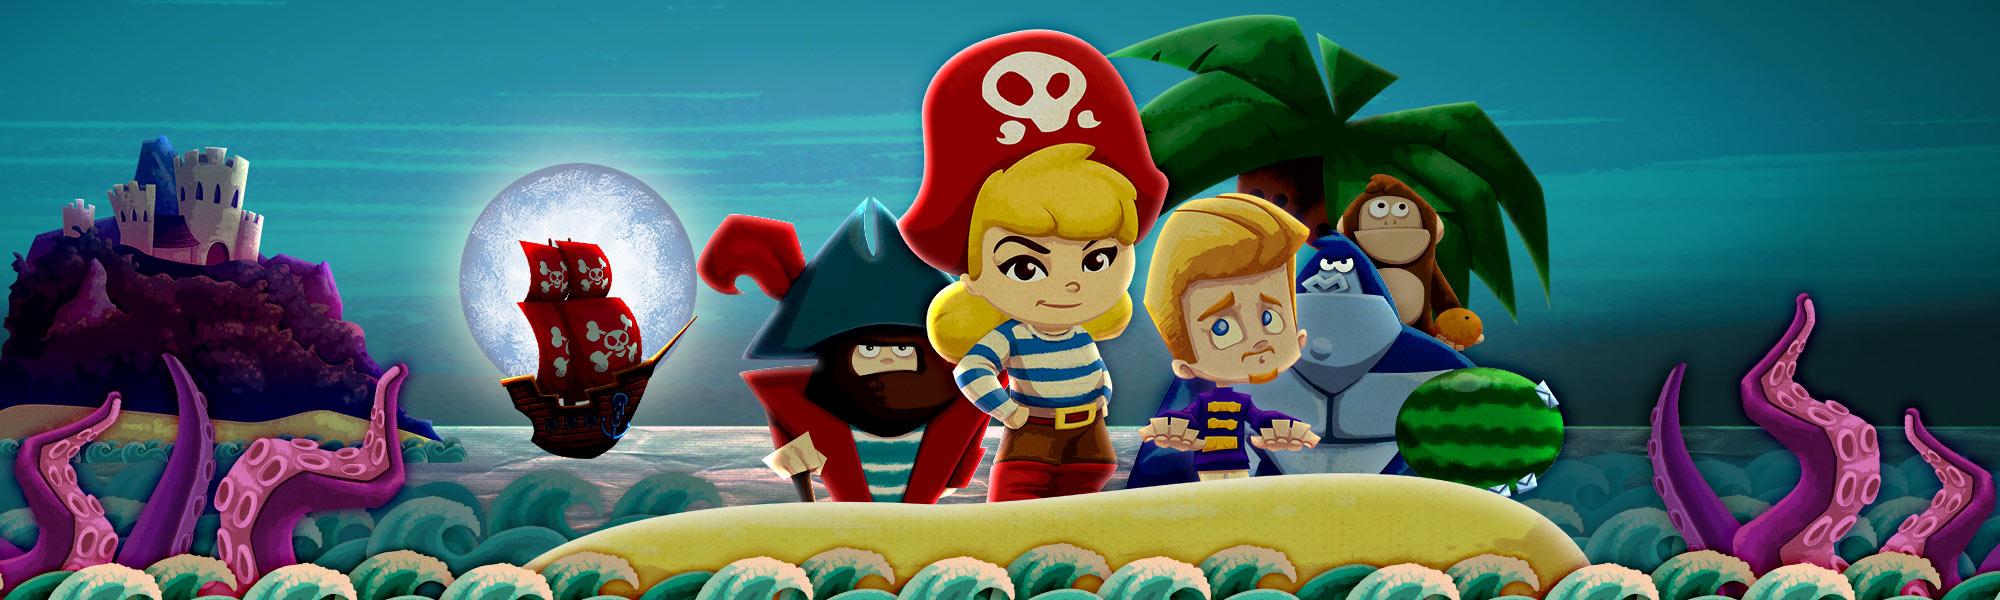 Pirate Princess App - StoryToys Apps